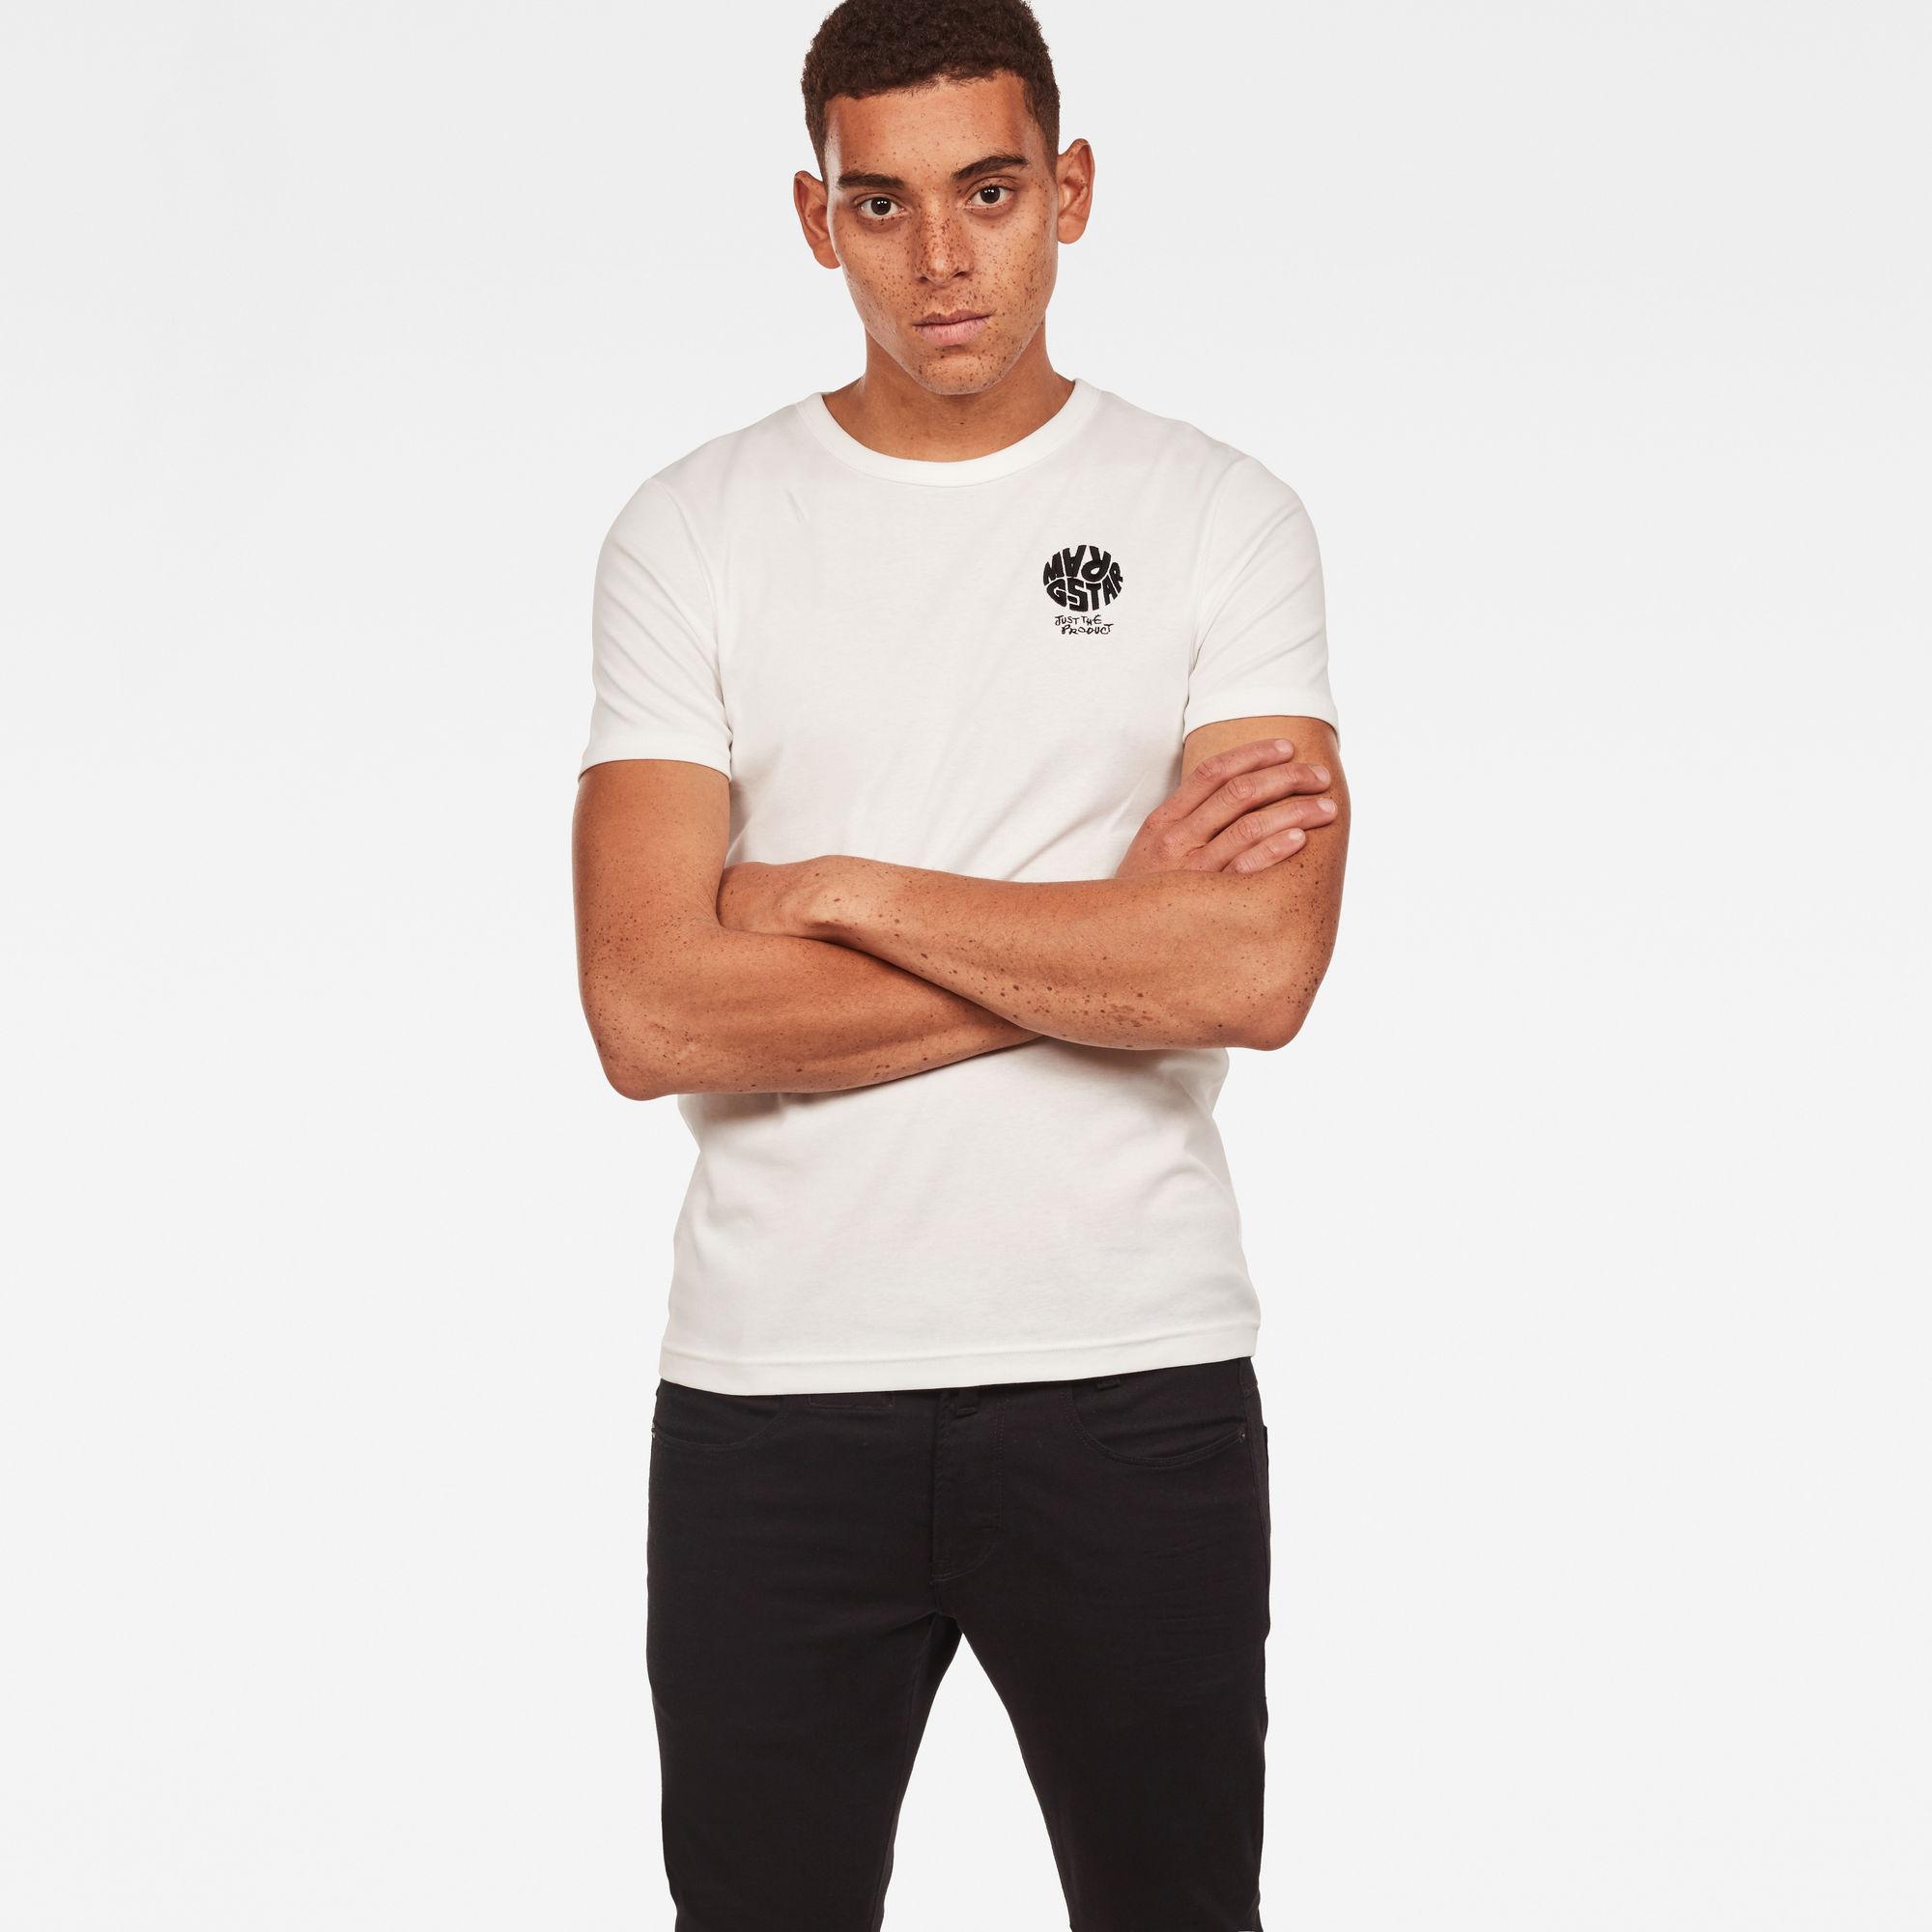 Image of G Star Raw Graphic 7 Slim T-Shirt